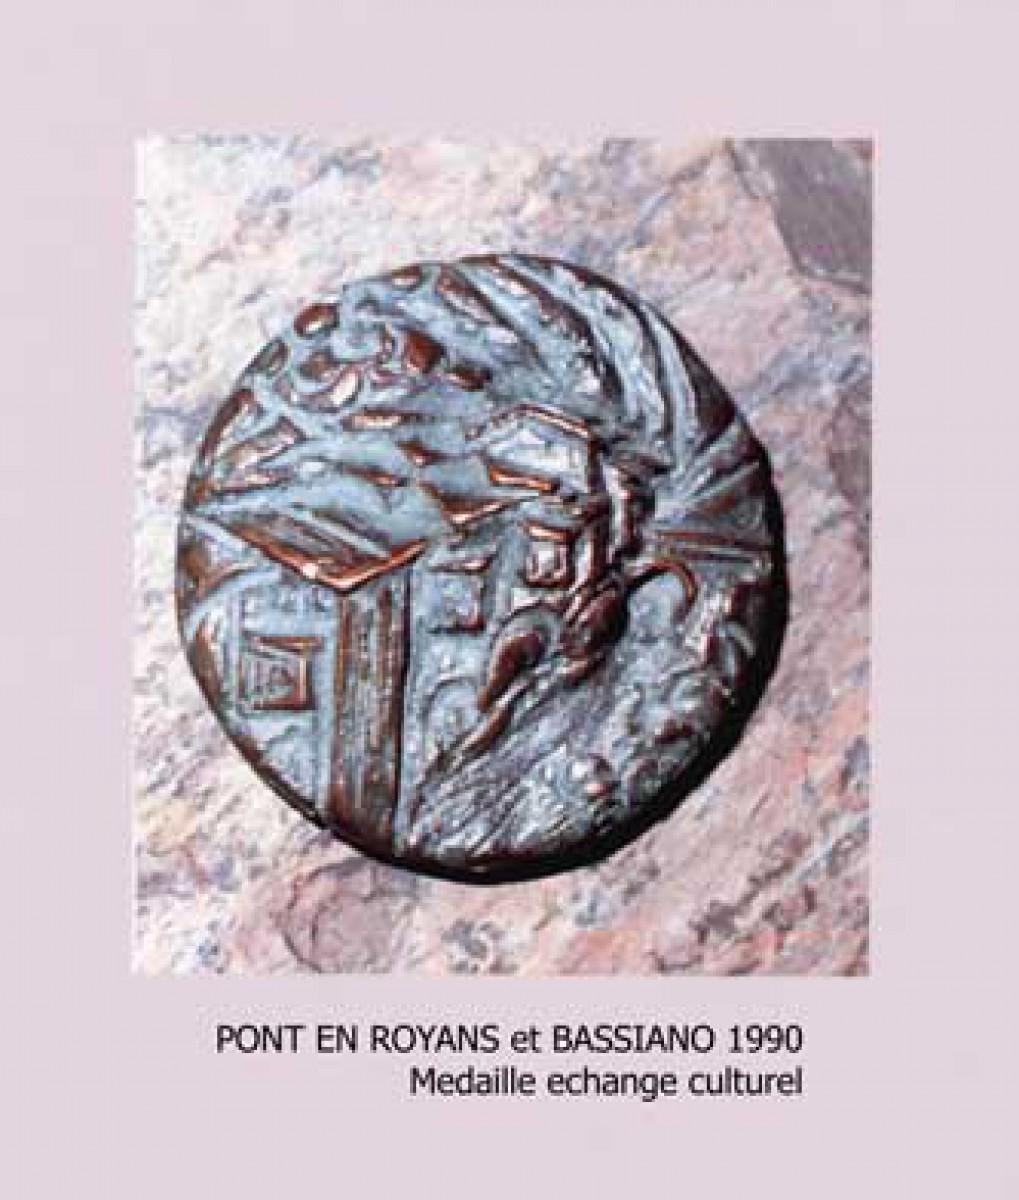 Medaiille Pont en Royans